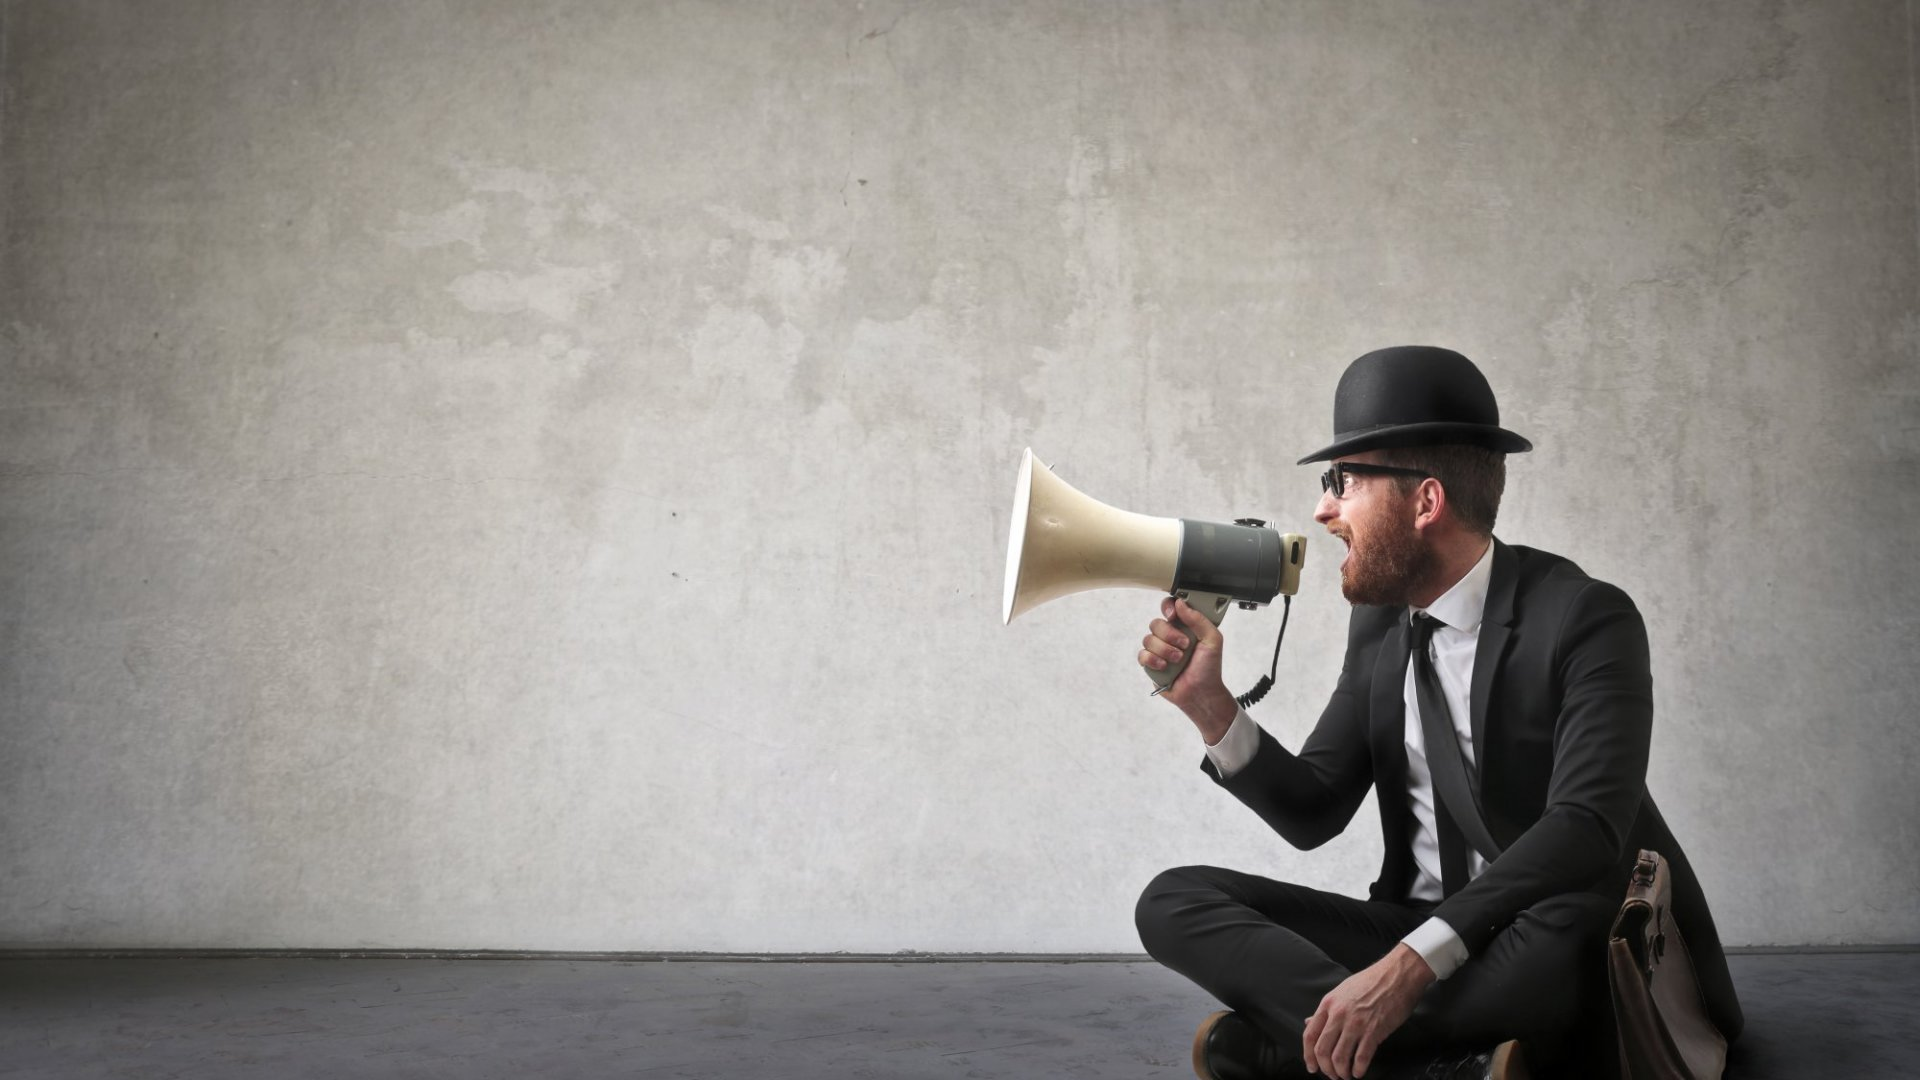 5 Old-School Marketing Techniques That Still Do the Job